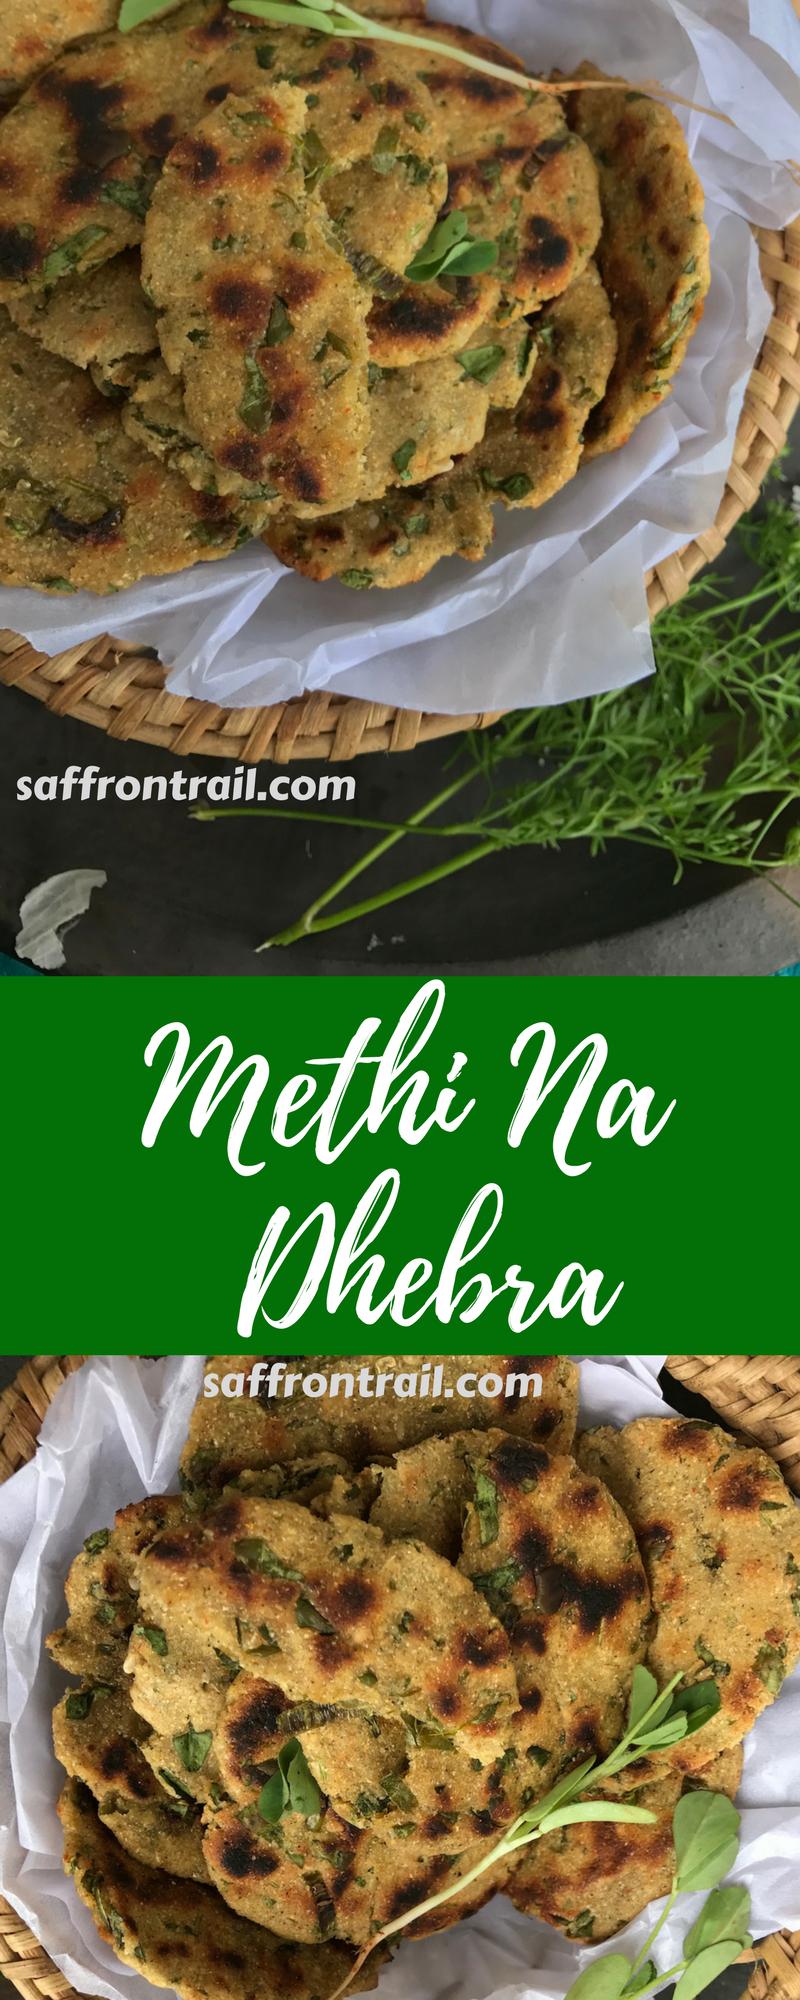 Methi Na Dhebra A Rustic Gluten Free Bread From Gujarat